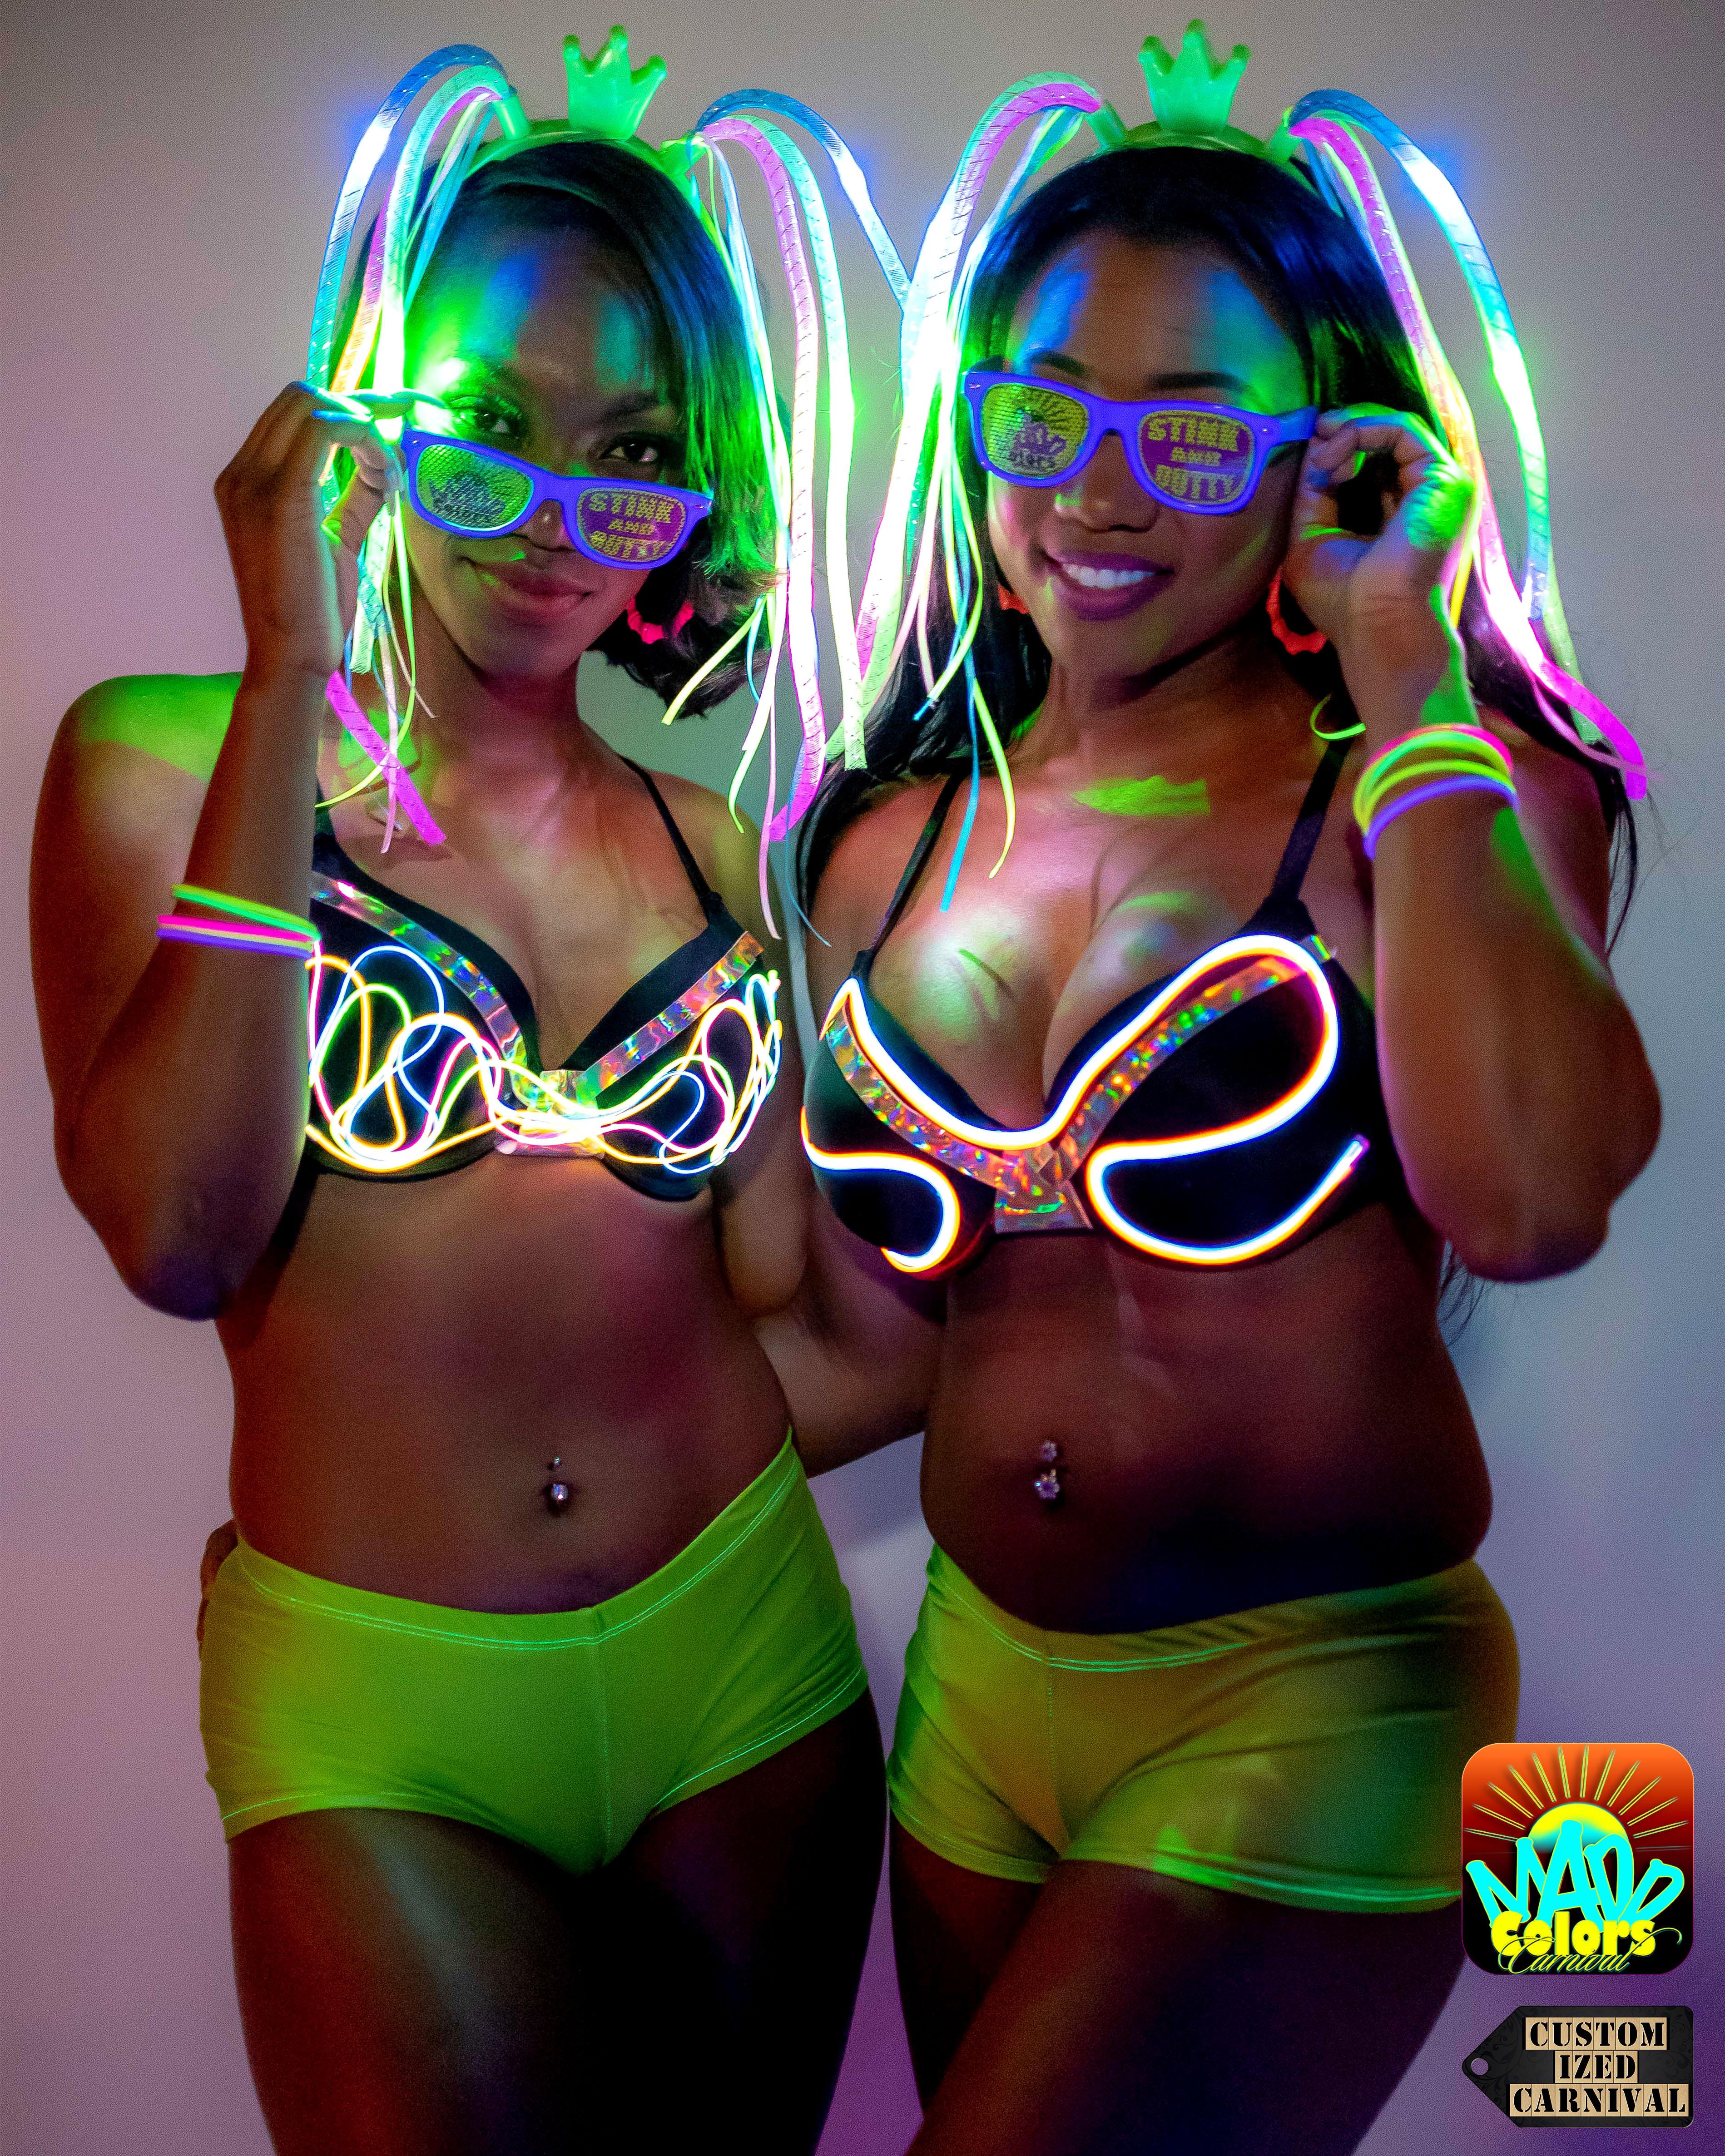 Grenada Monday Night Mas 2018 – Madd Colors Carnival